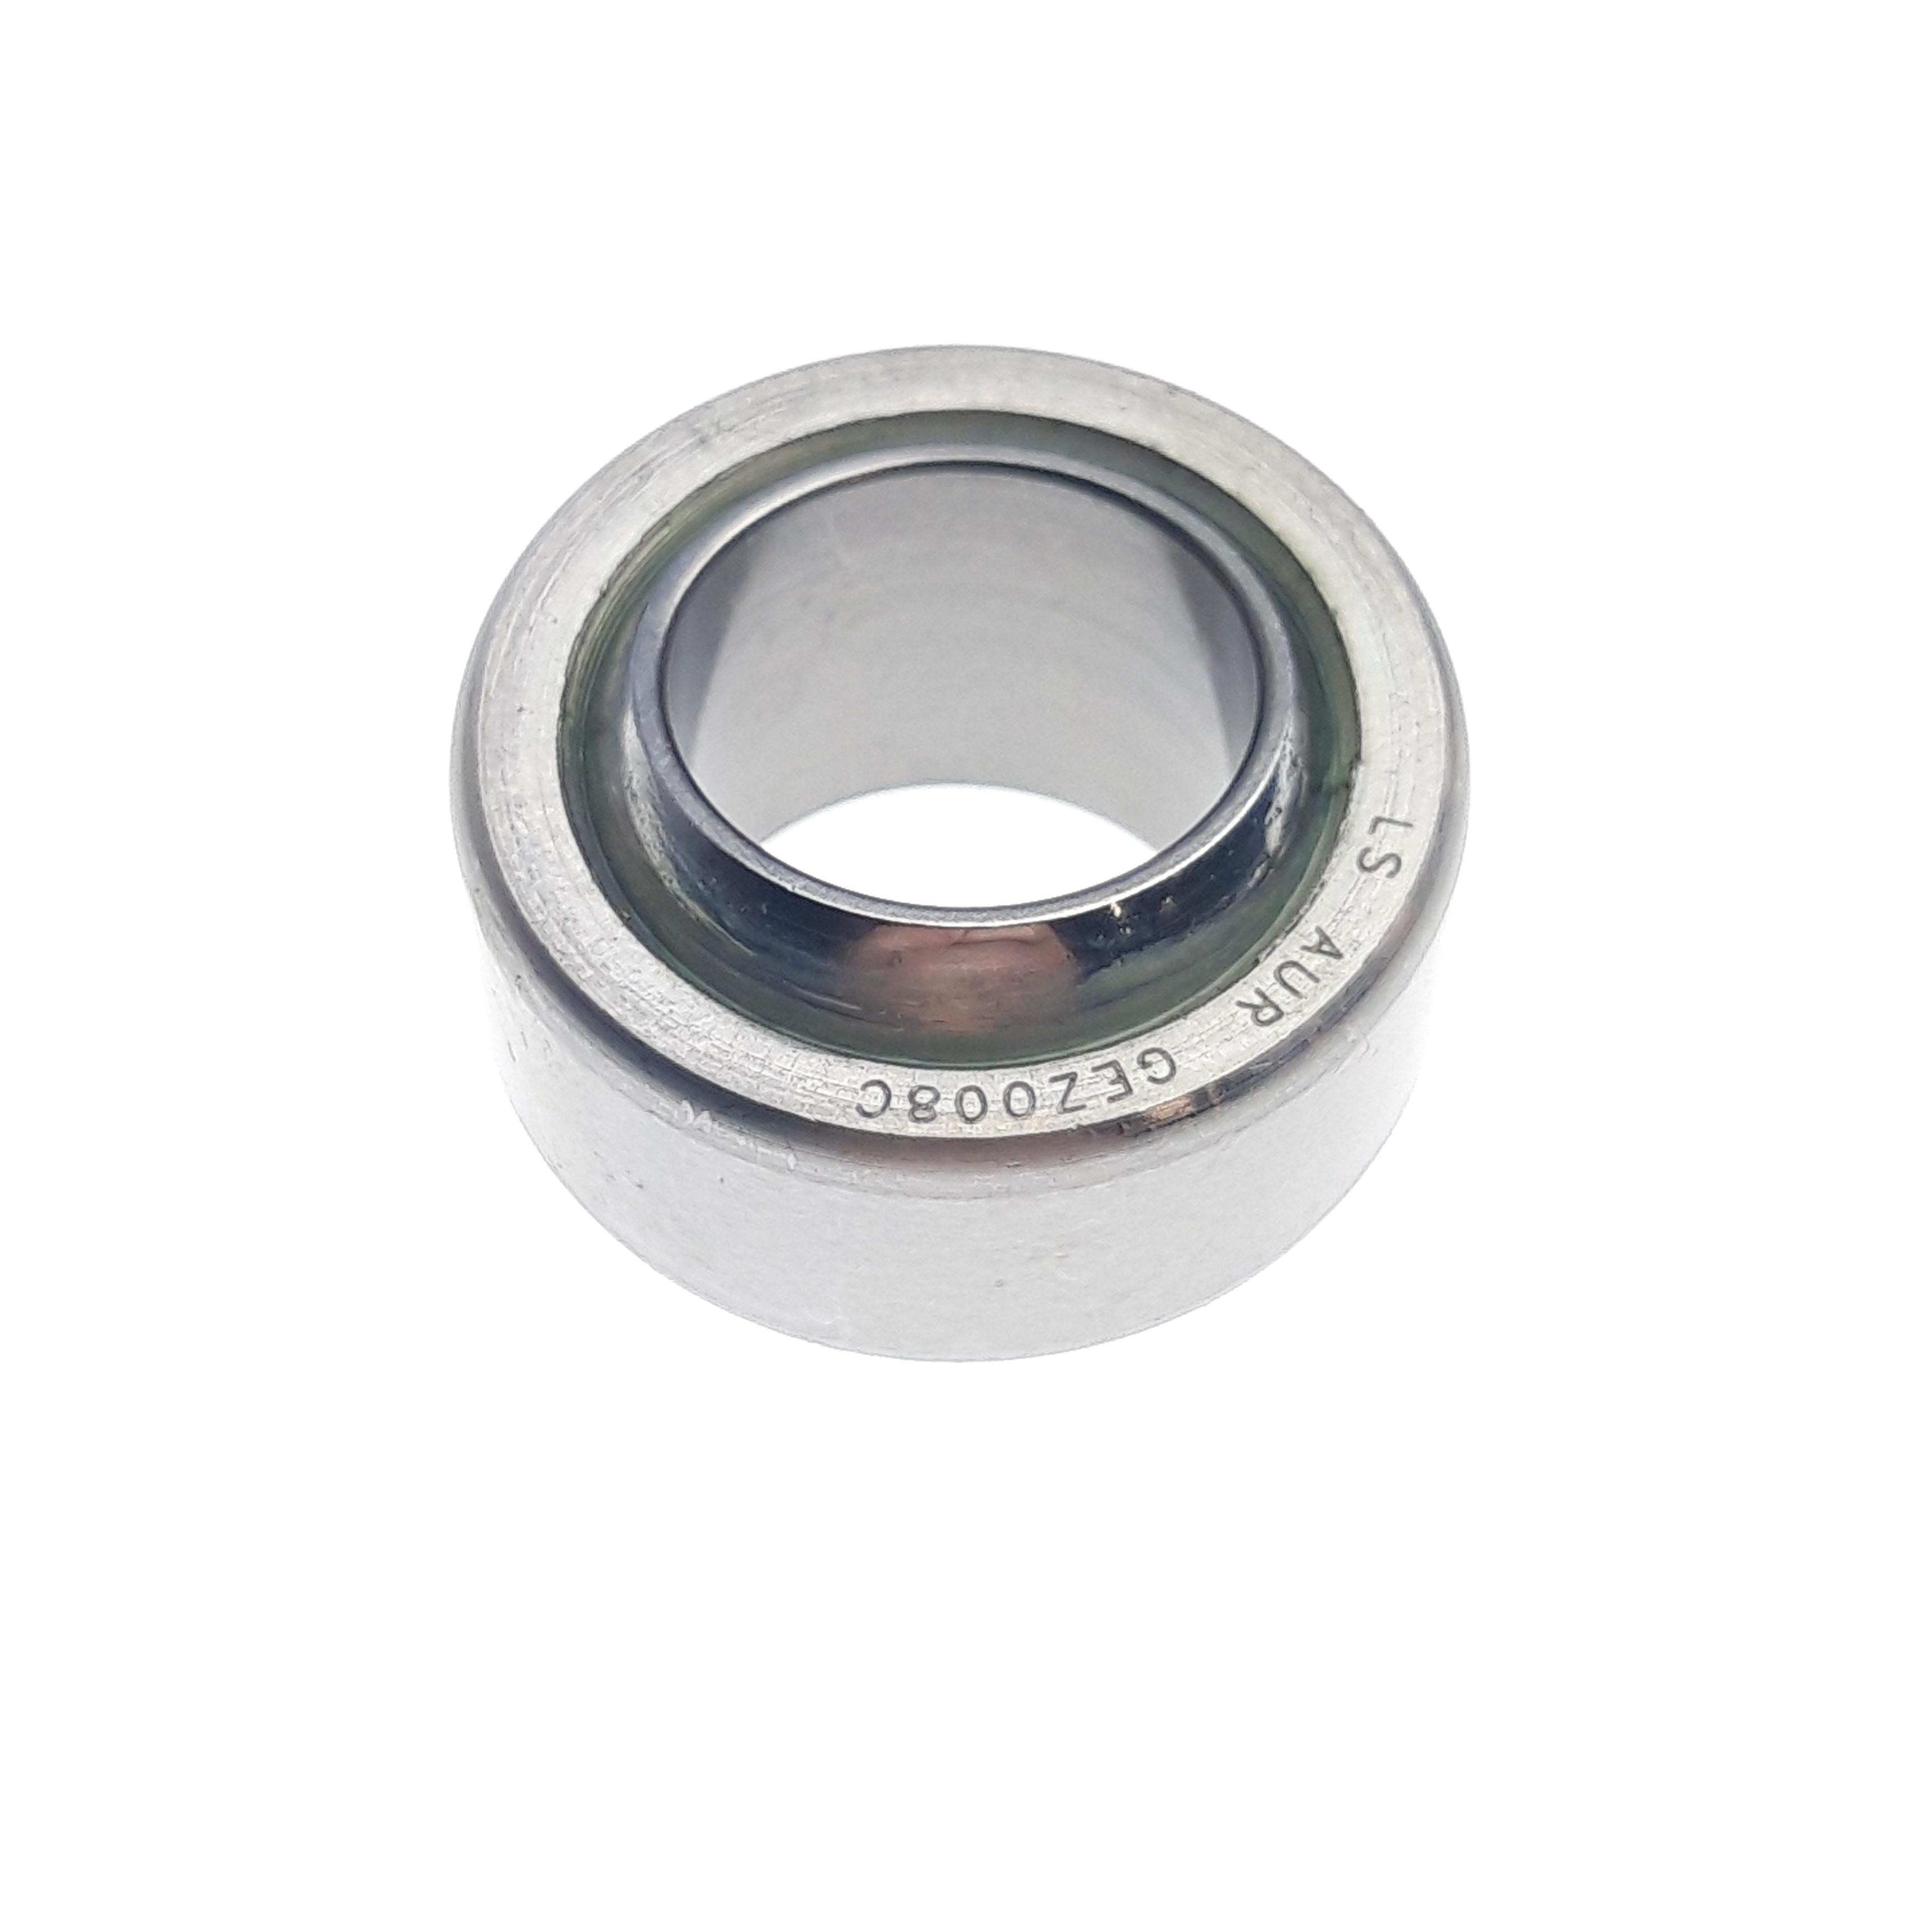 Bearing: Spherical (0.875 OD X 0.375 W)